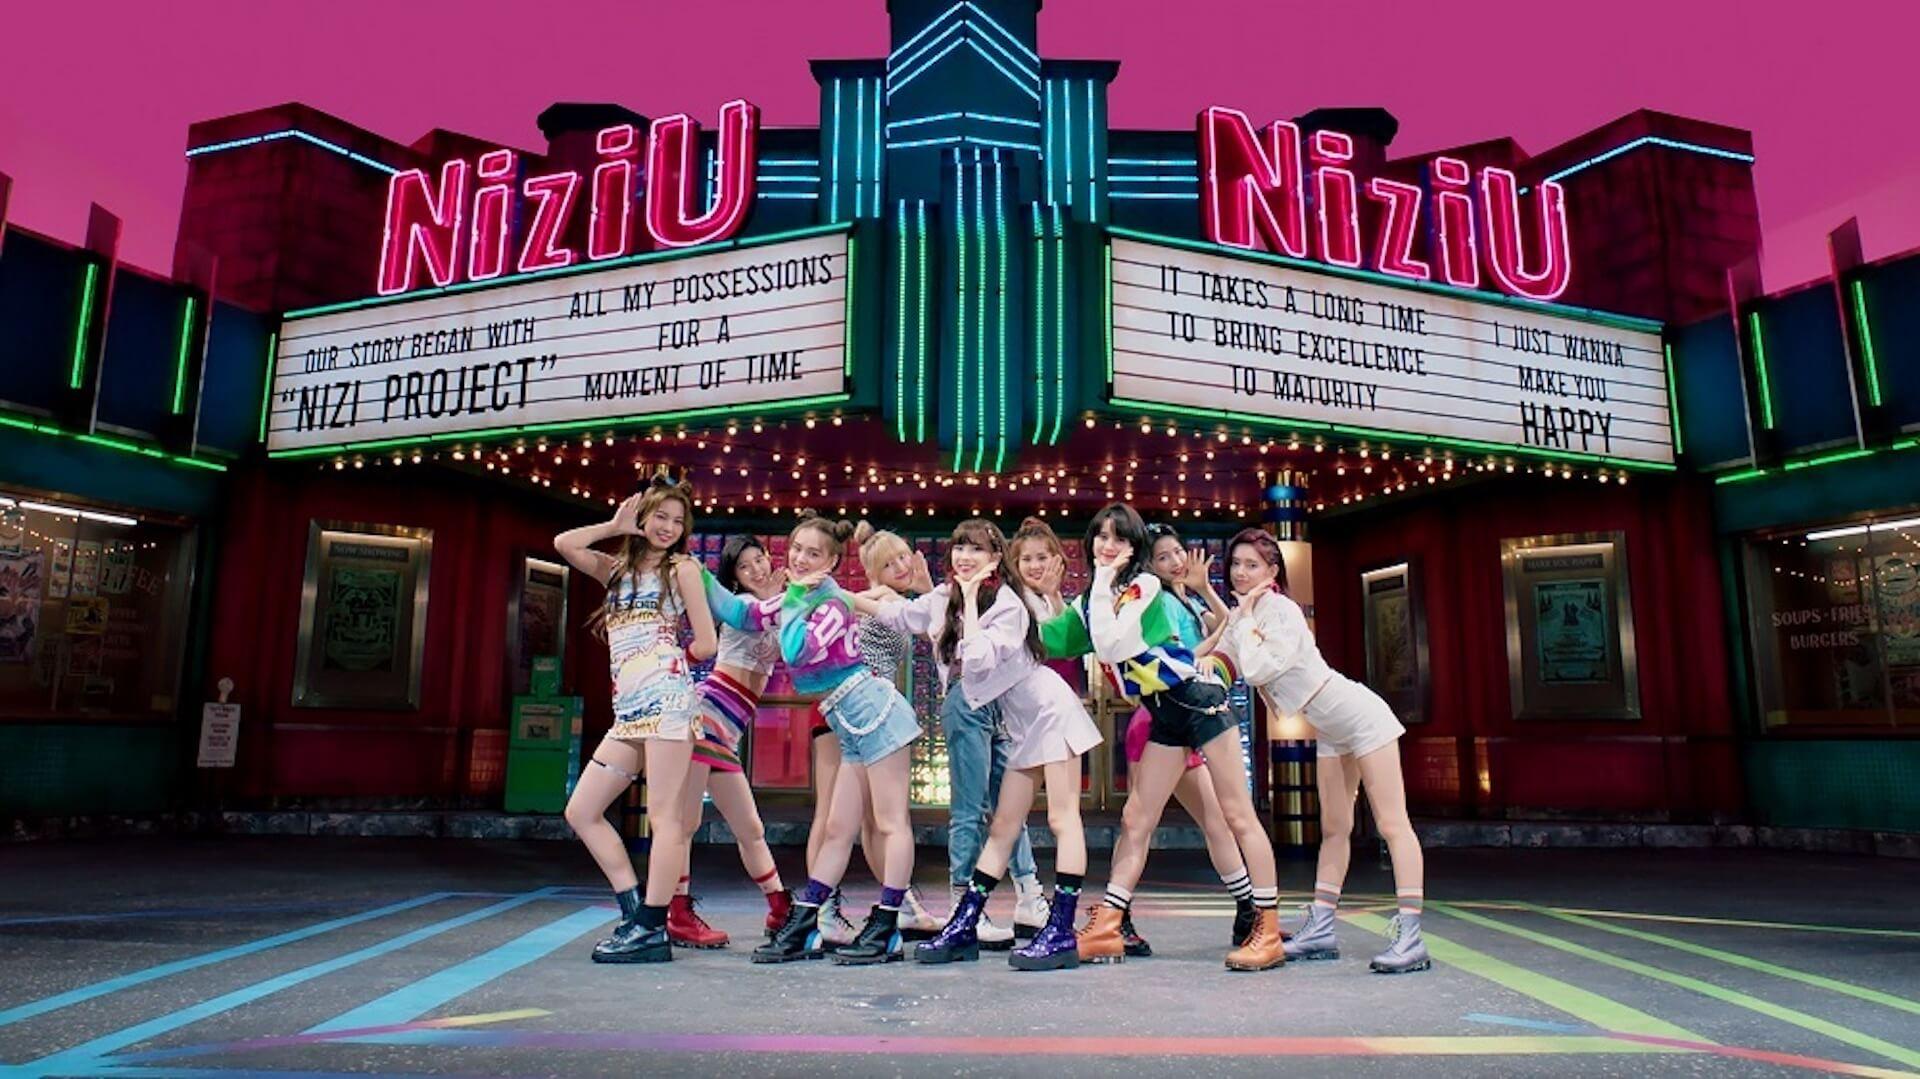 "NiziU初のミュージックビデオ""Make you happy""が公開初日に1,000万回再生を記録!ファンクラブ「WithU」も本日プレオープン music200701_niziu_mv_4"